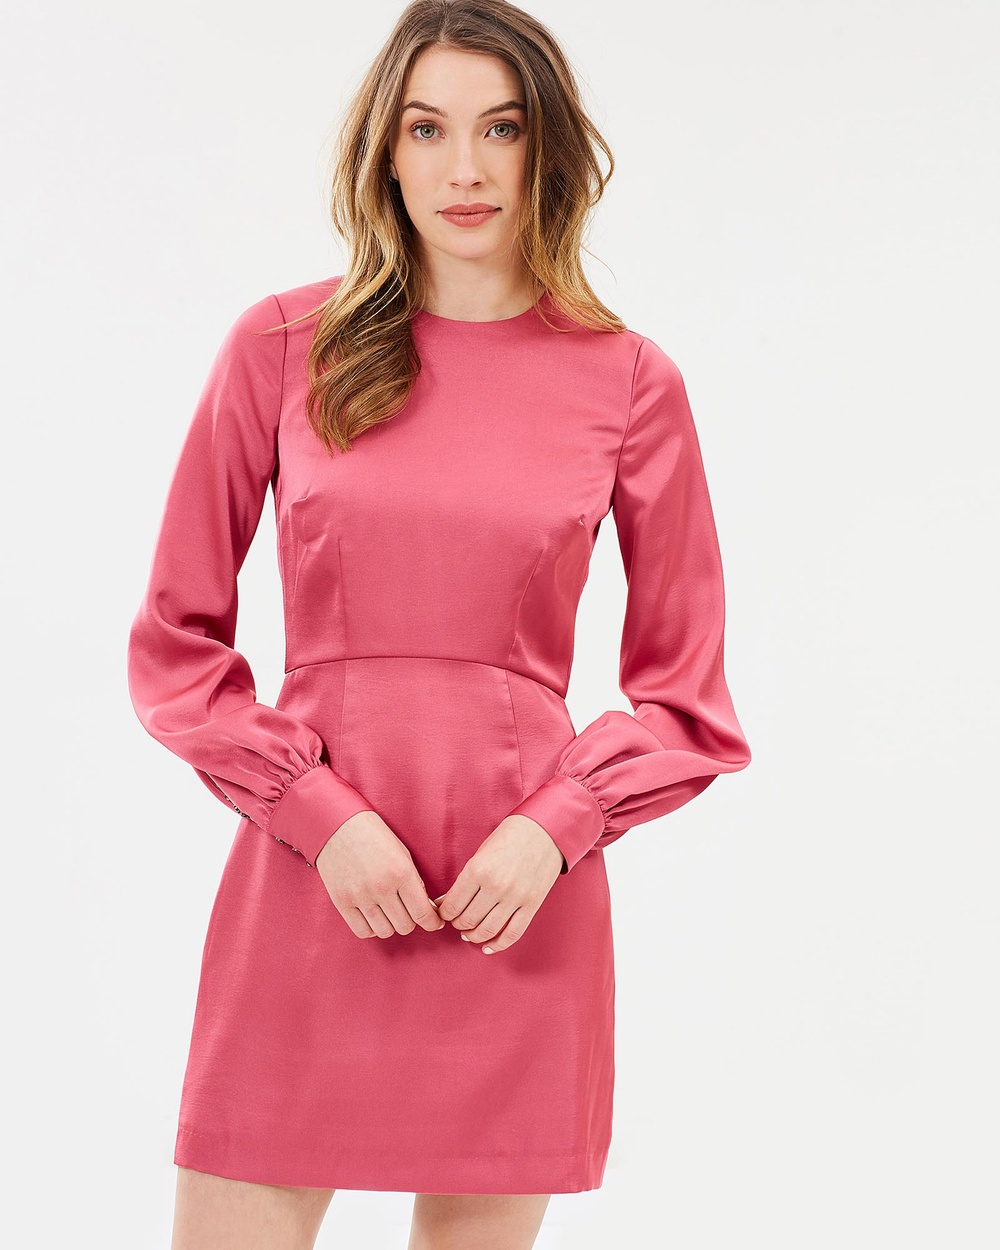 Cooper St Stella Long Sleeve Mini Dress Dresses Deep Rose Stella Long Sleeve Mini Dress